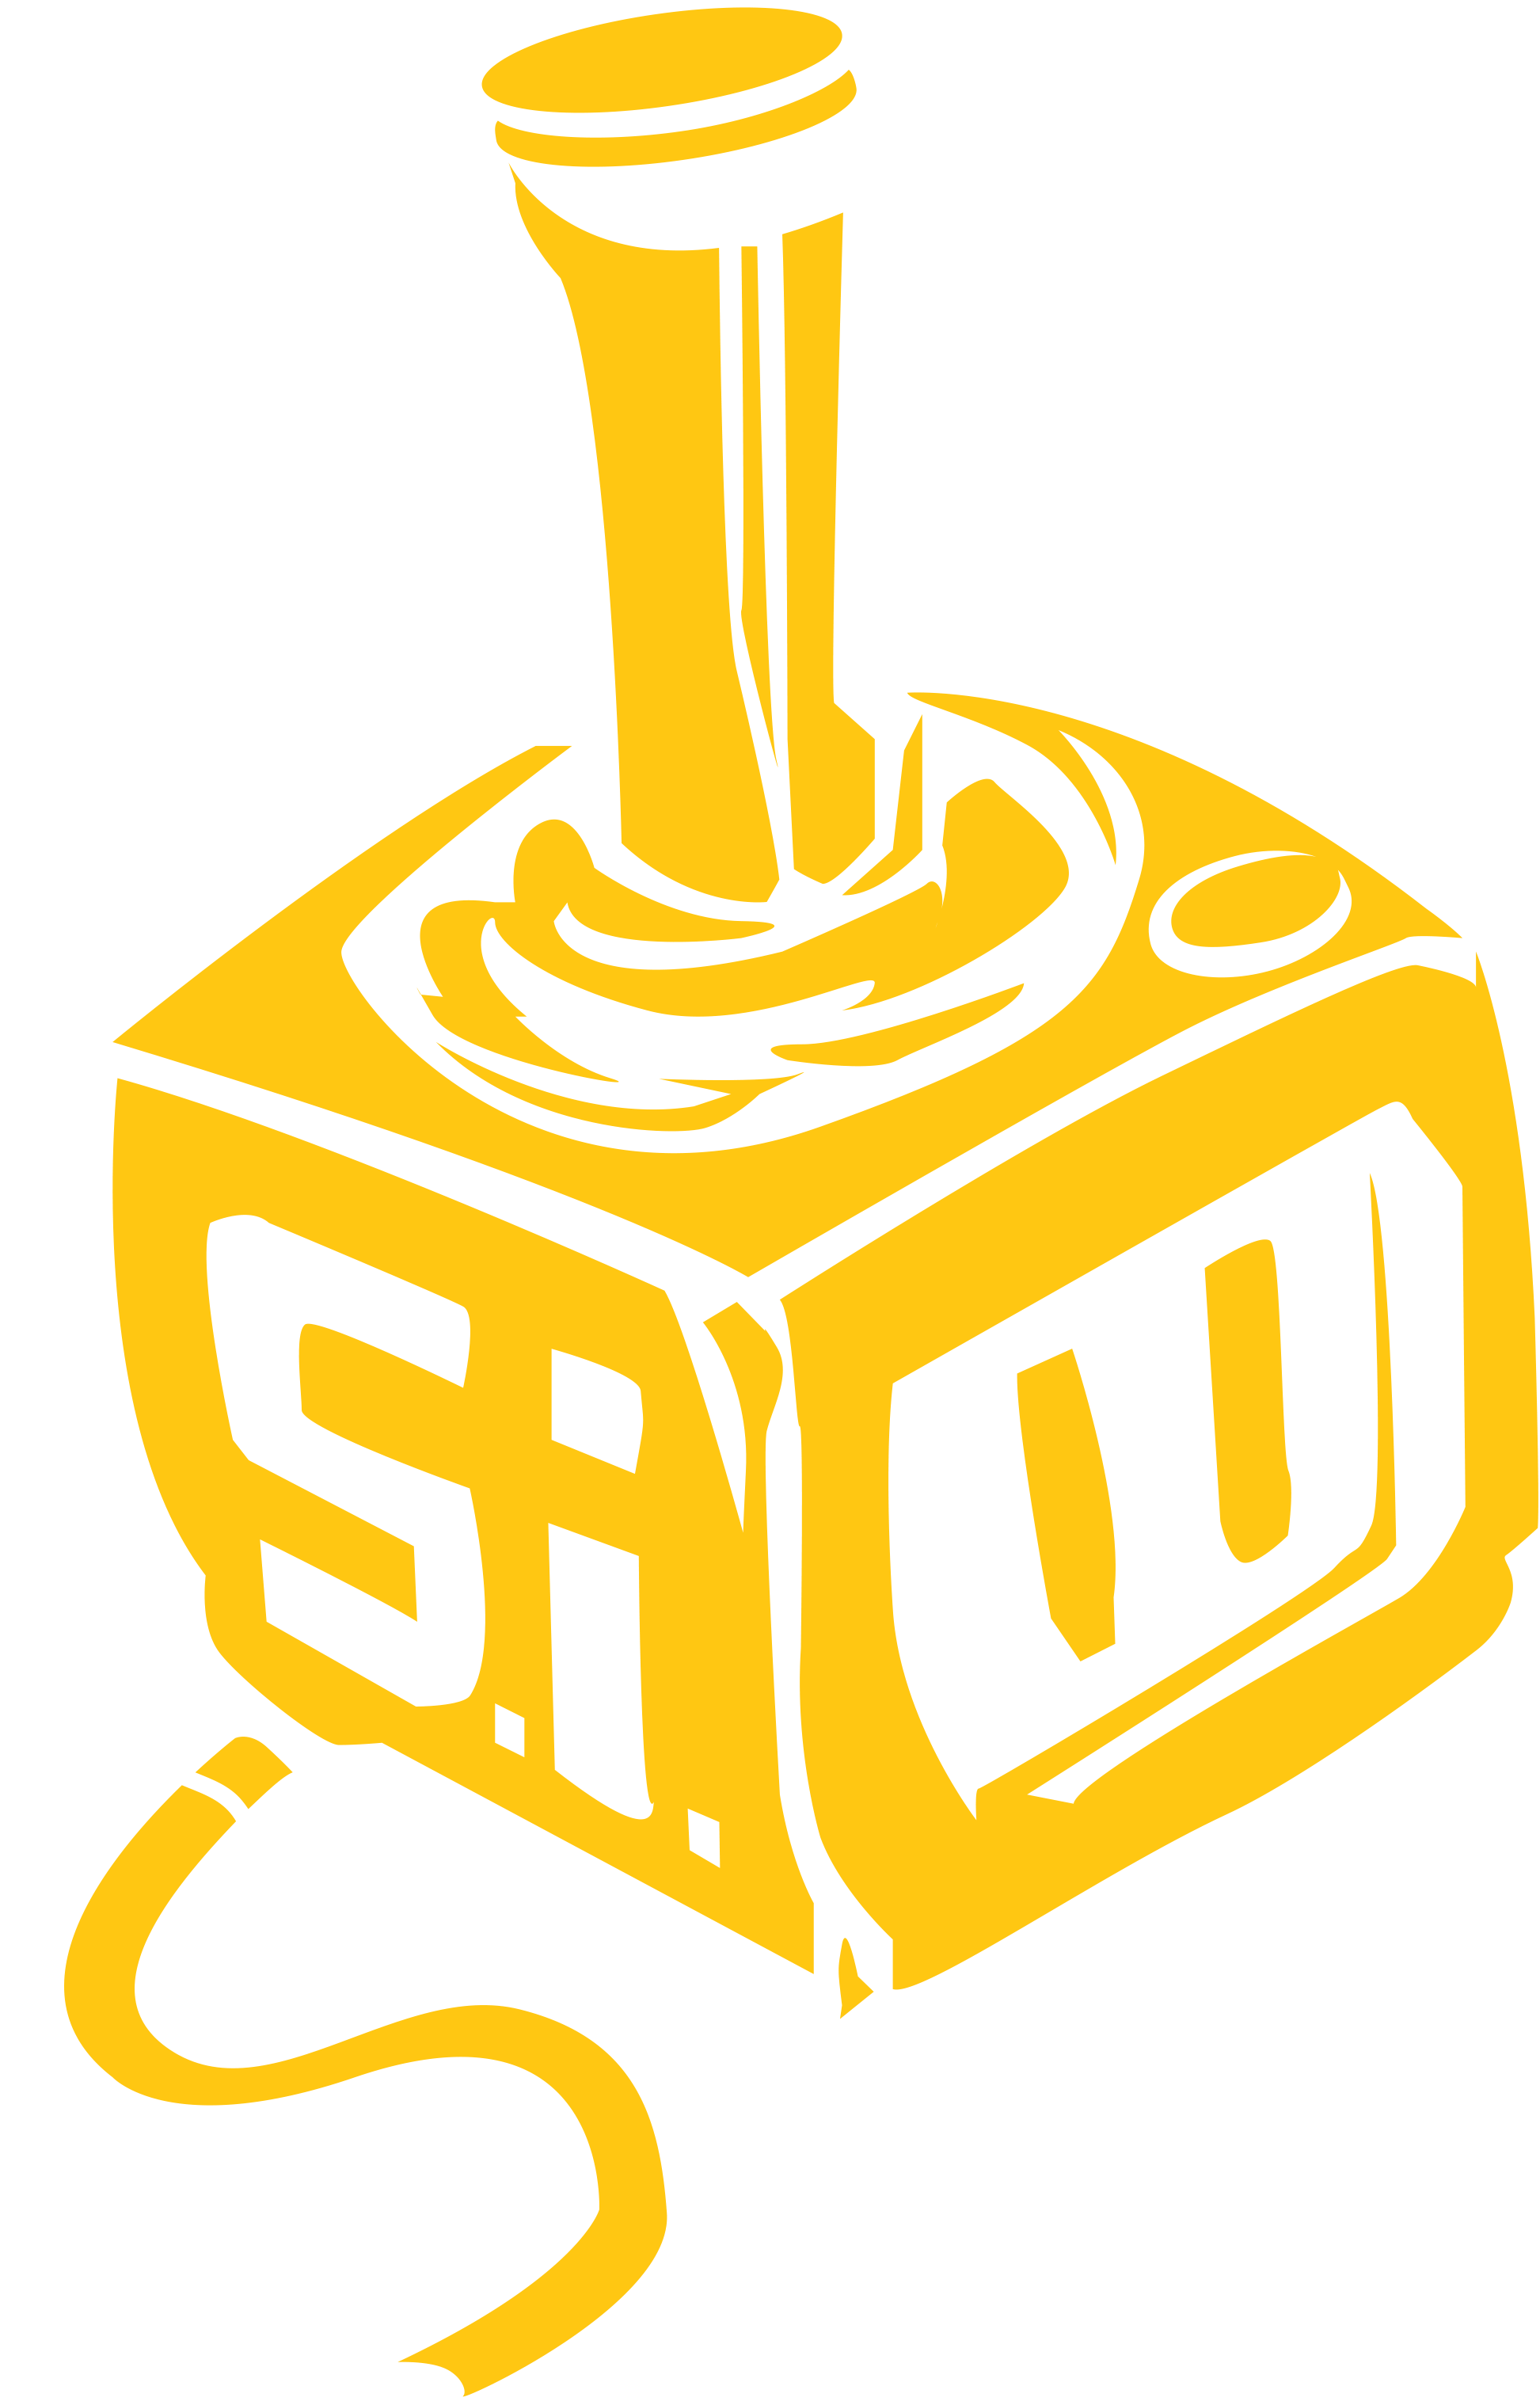 Seattle Indies logo - transparent background